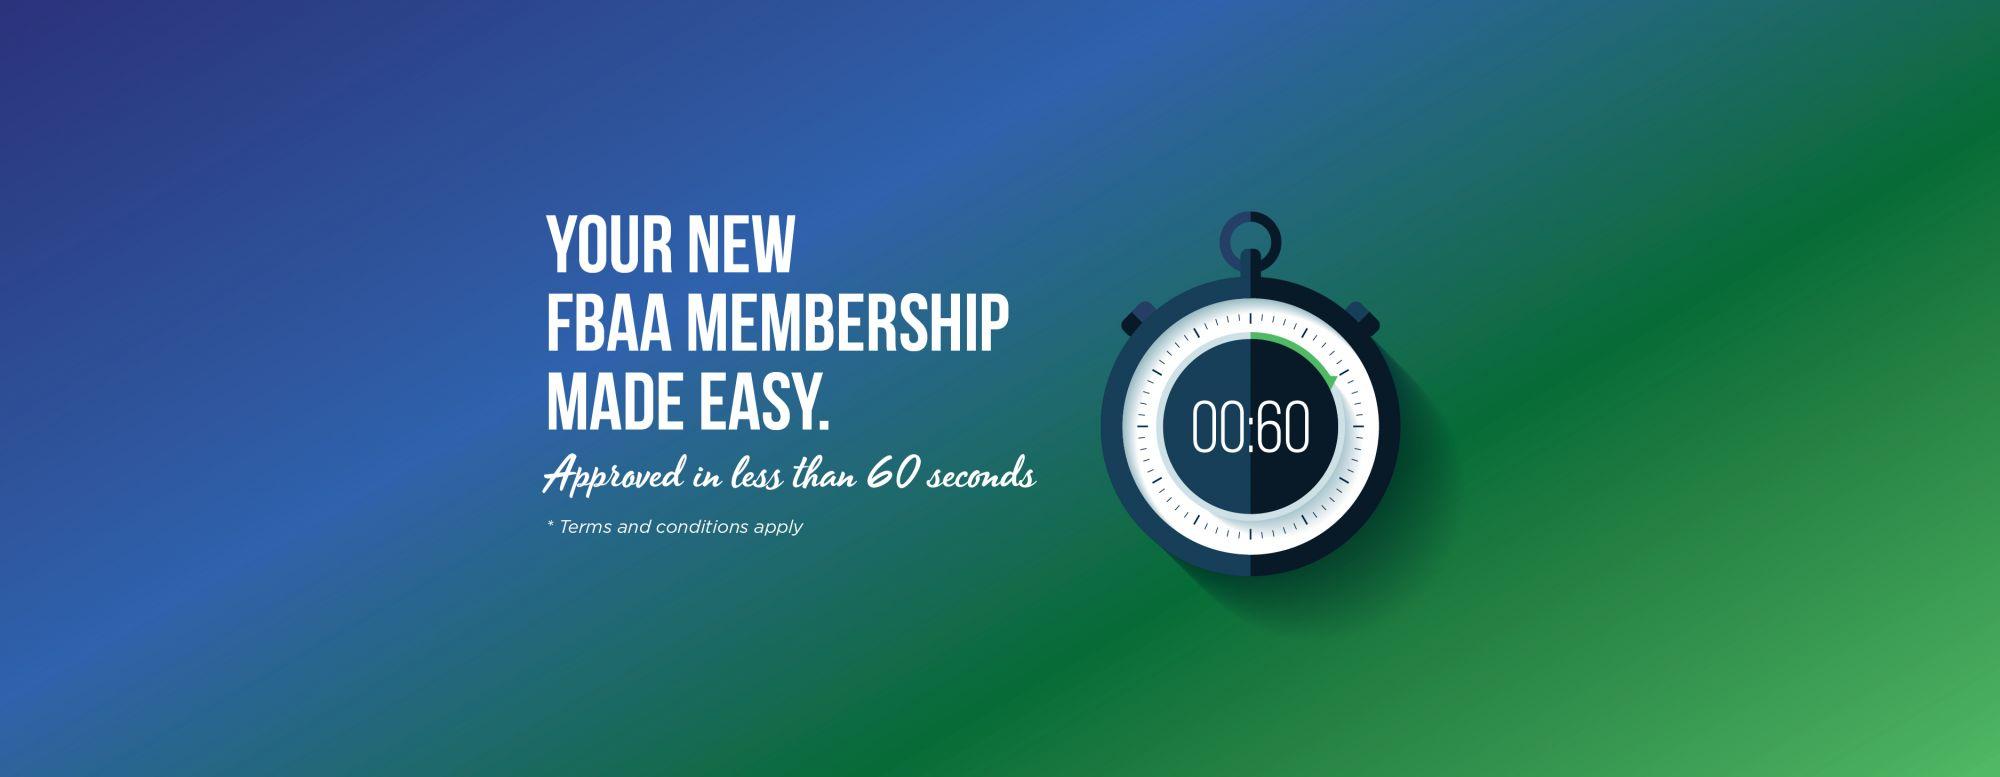 Progress your broking career with an FBAA membership